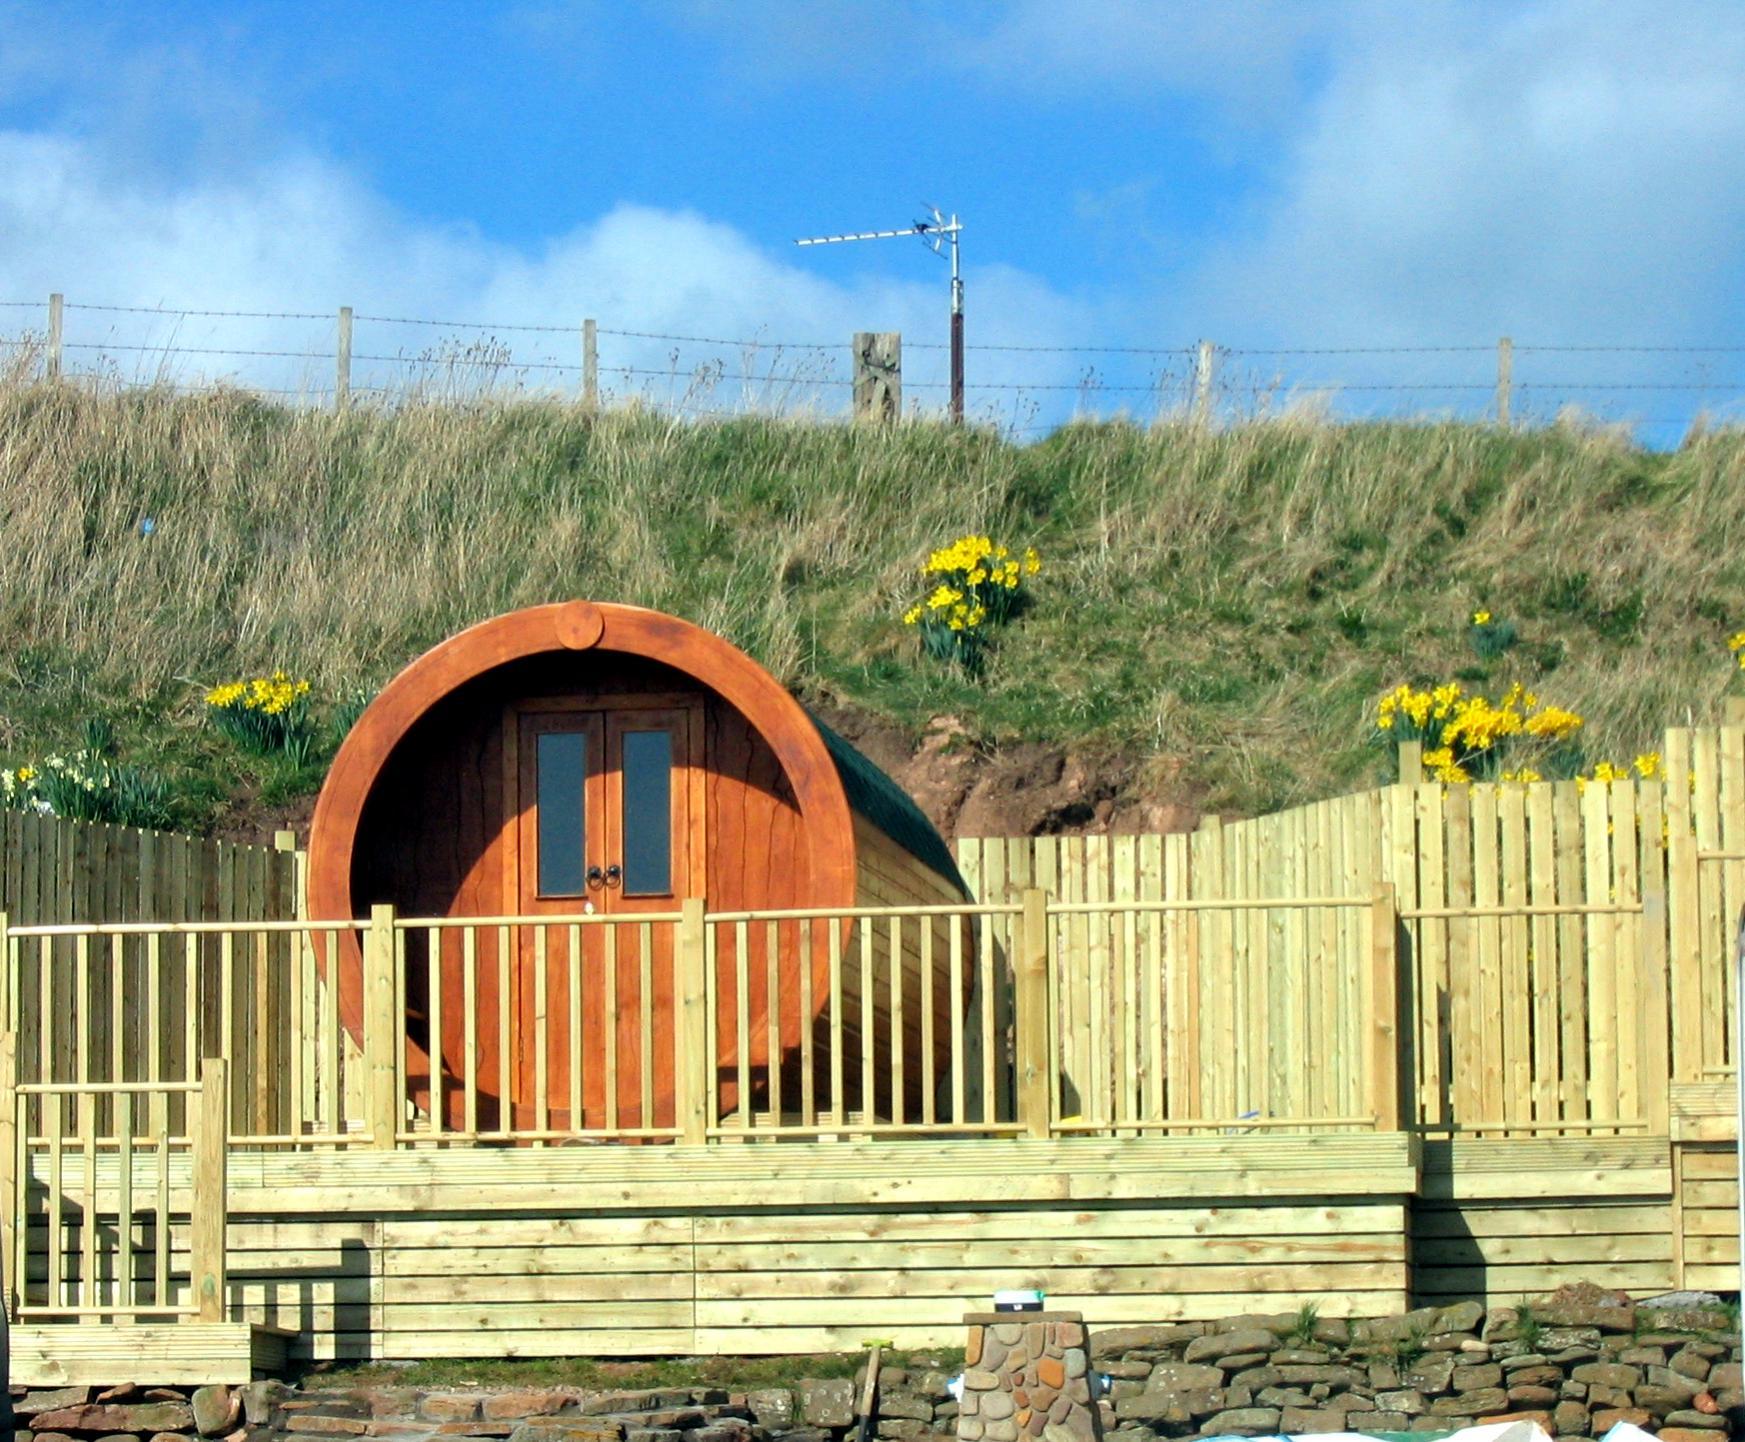 tiny tubular microlodge hobbit house